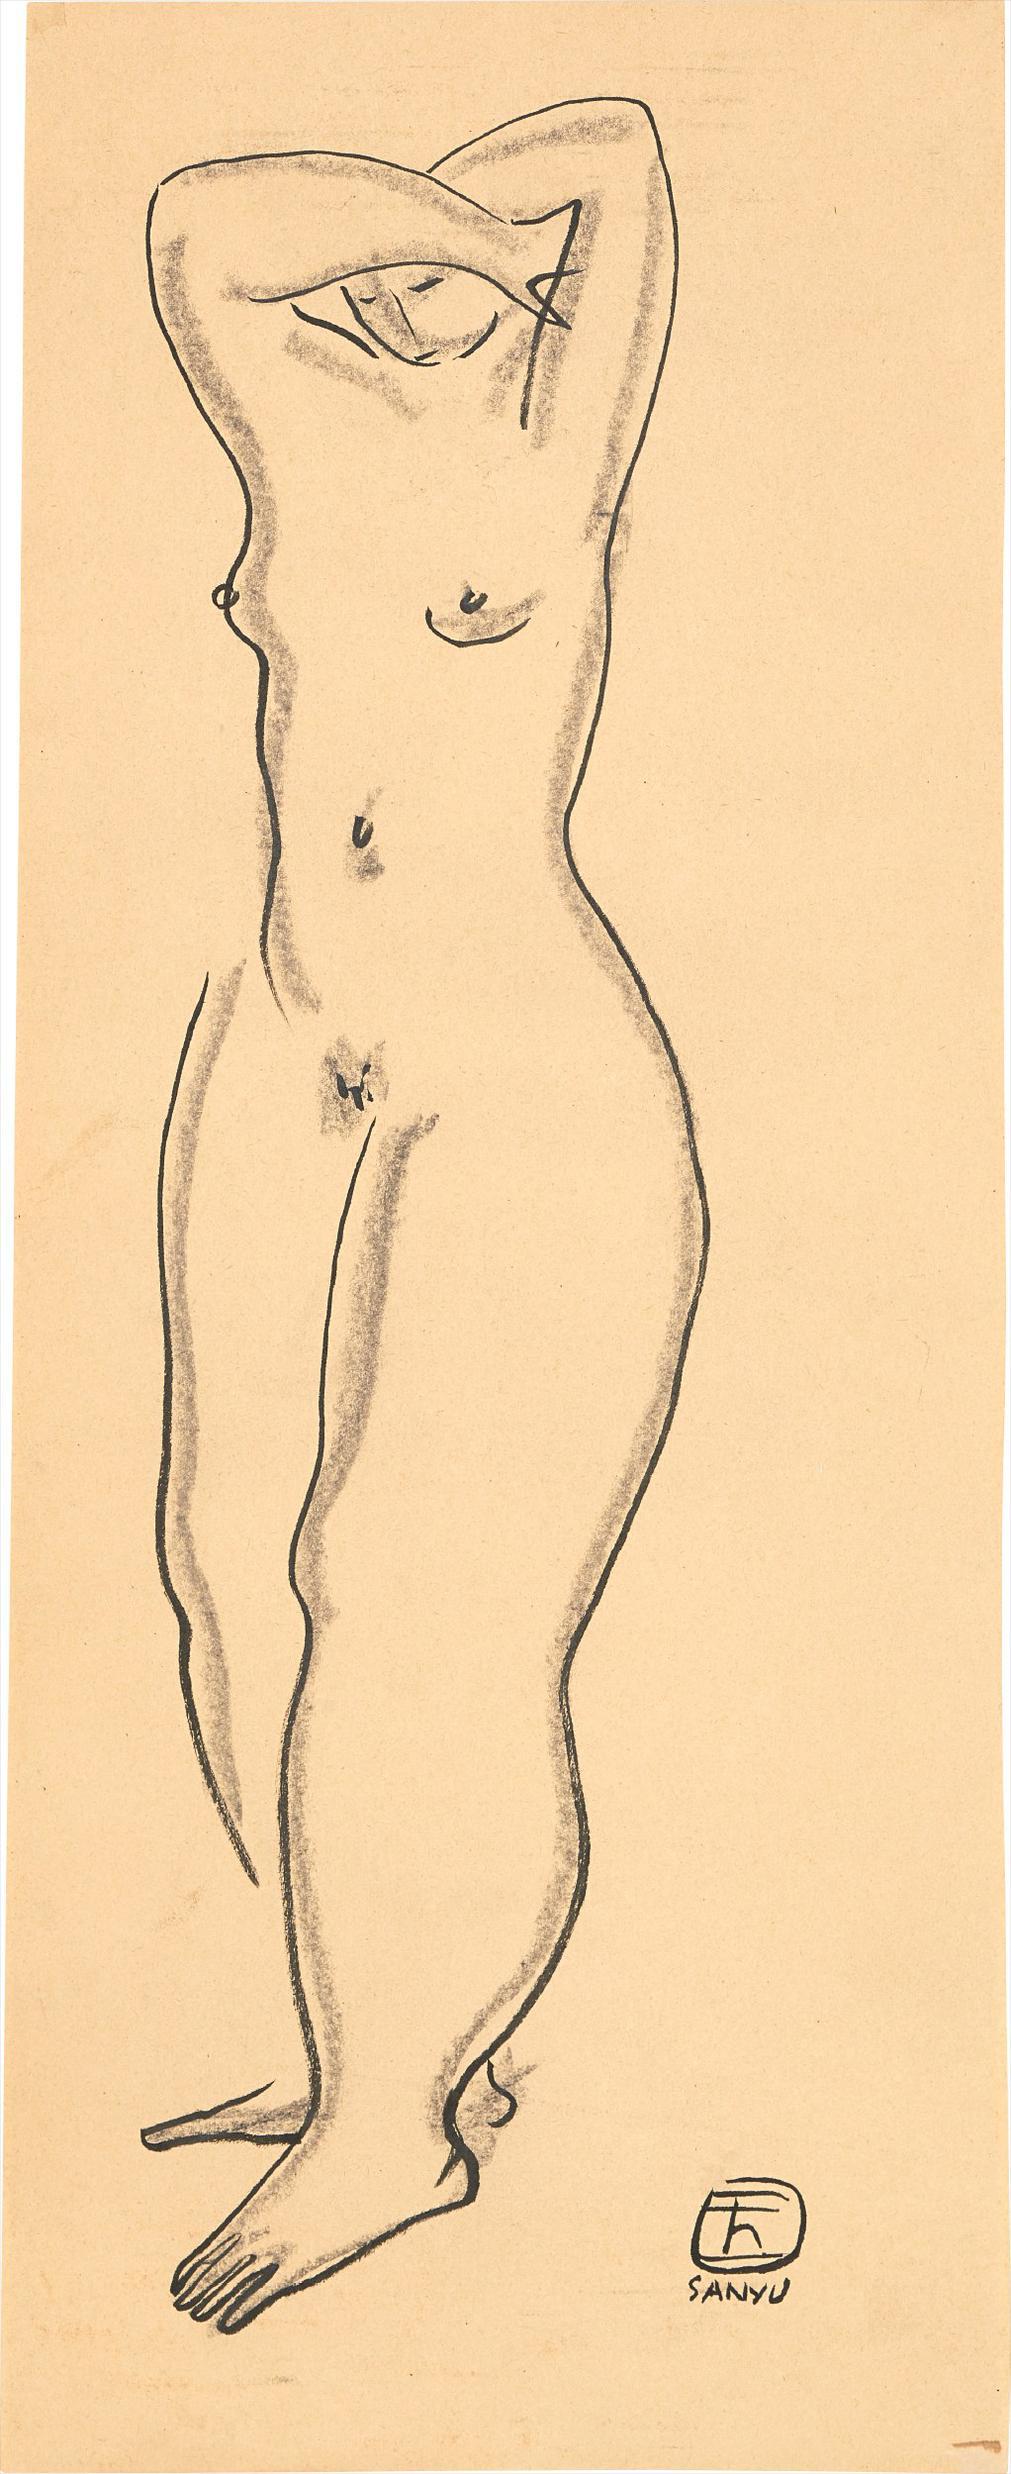 Sanyu-Standing Nude-